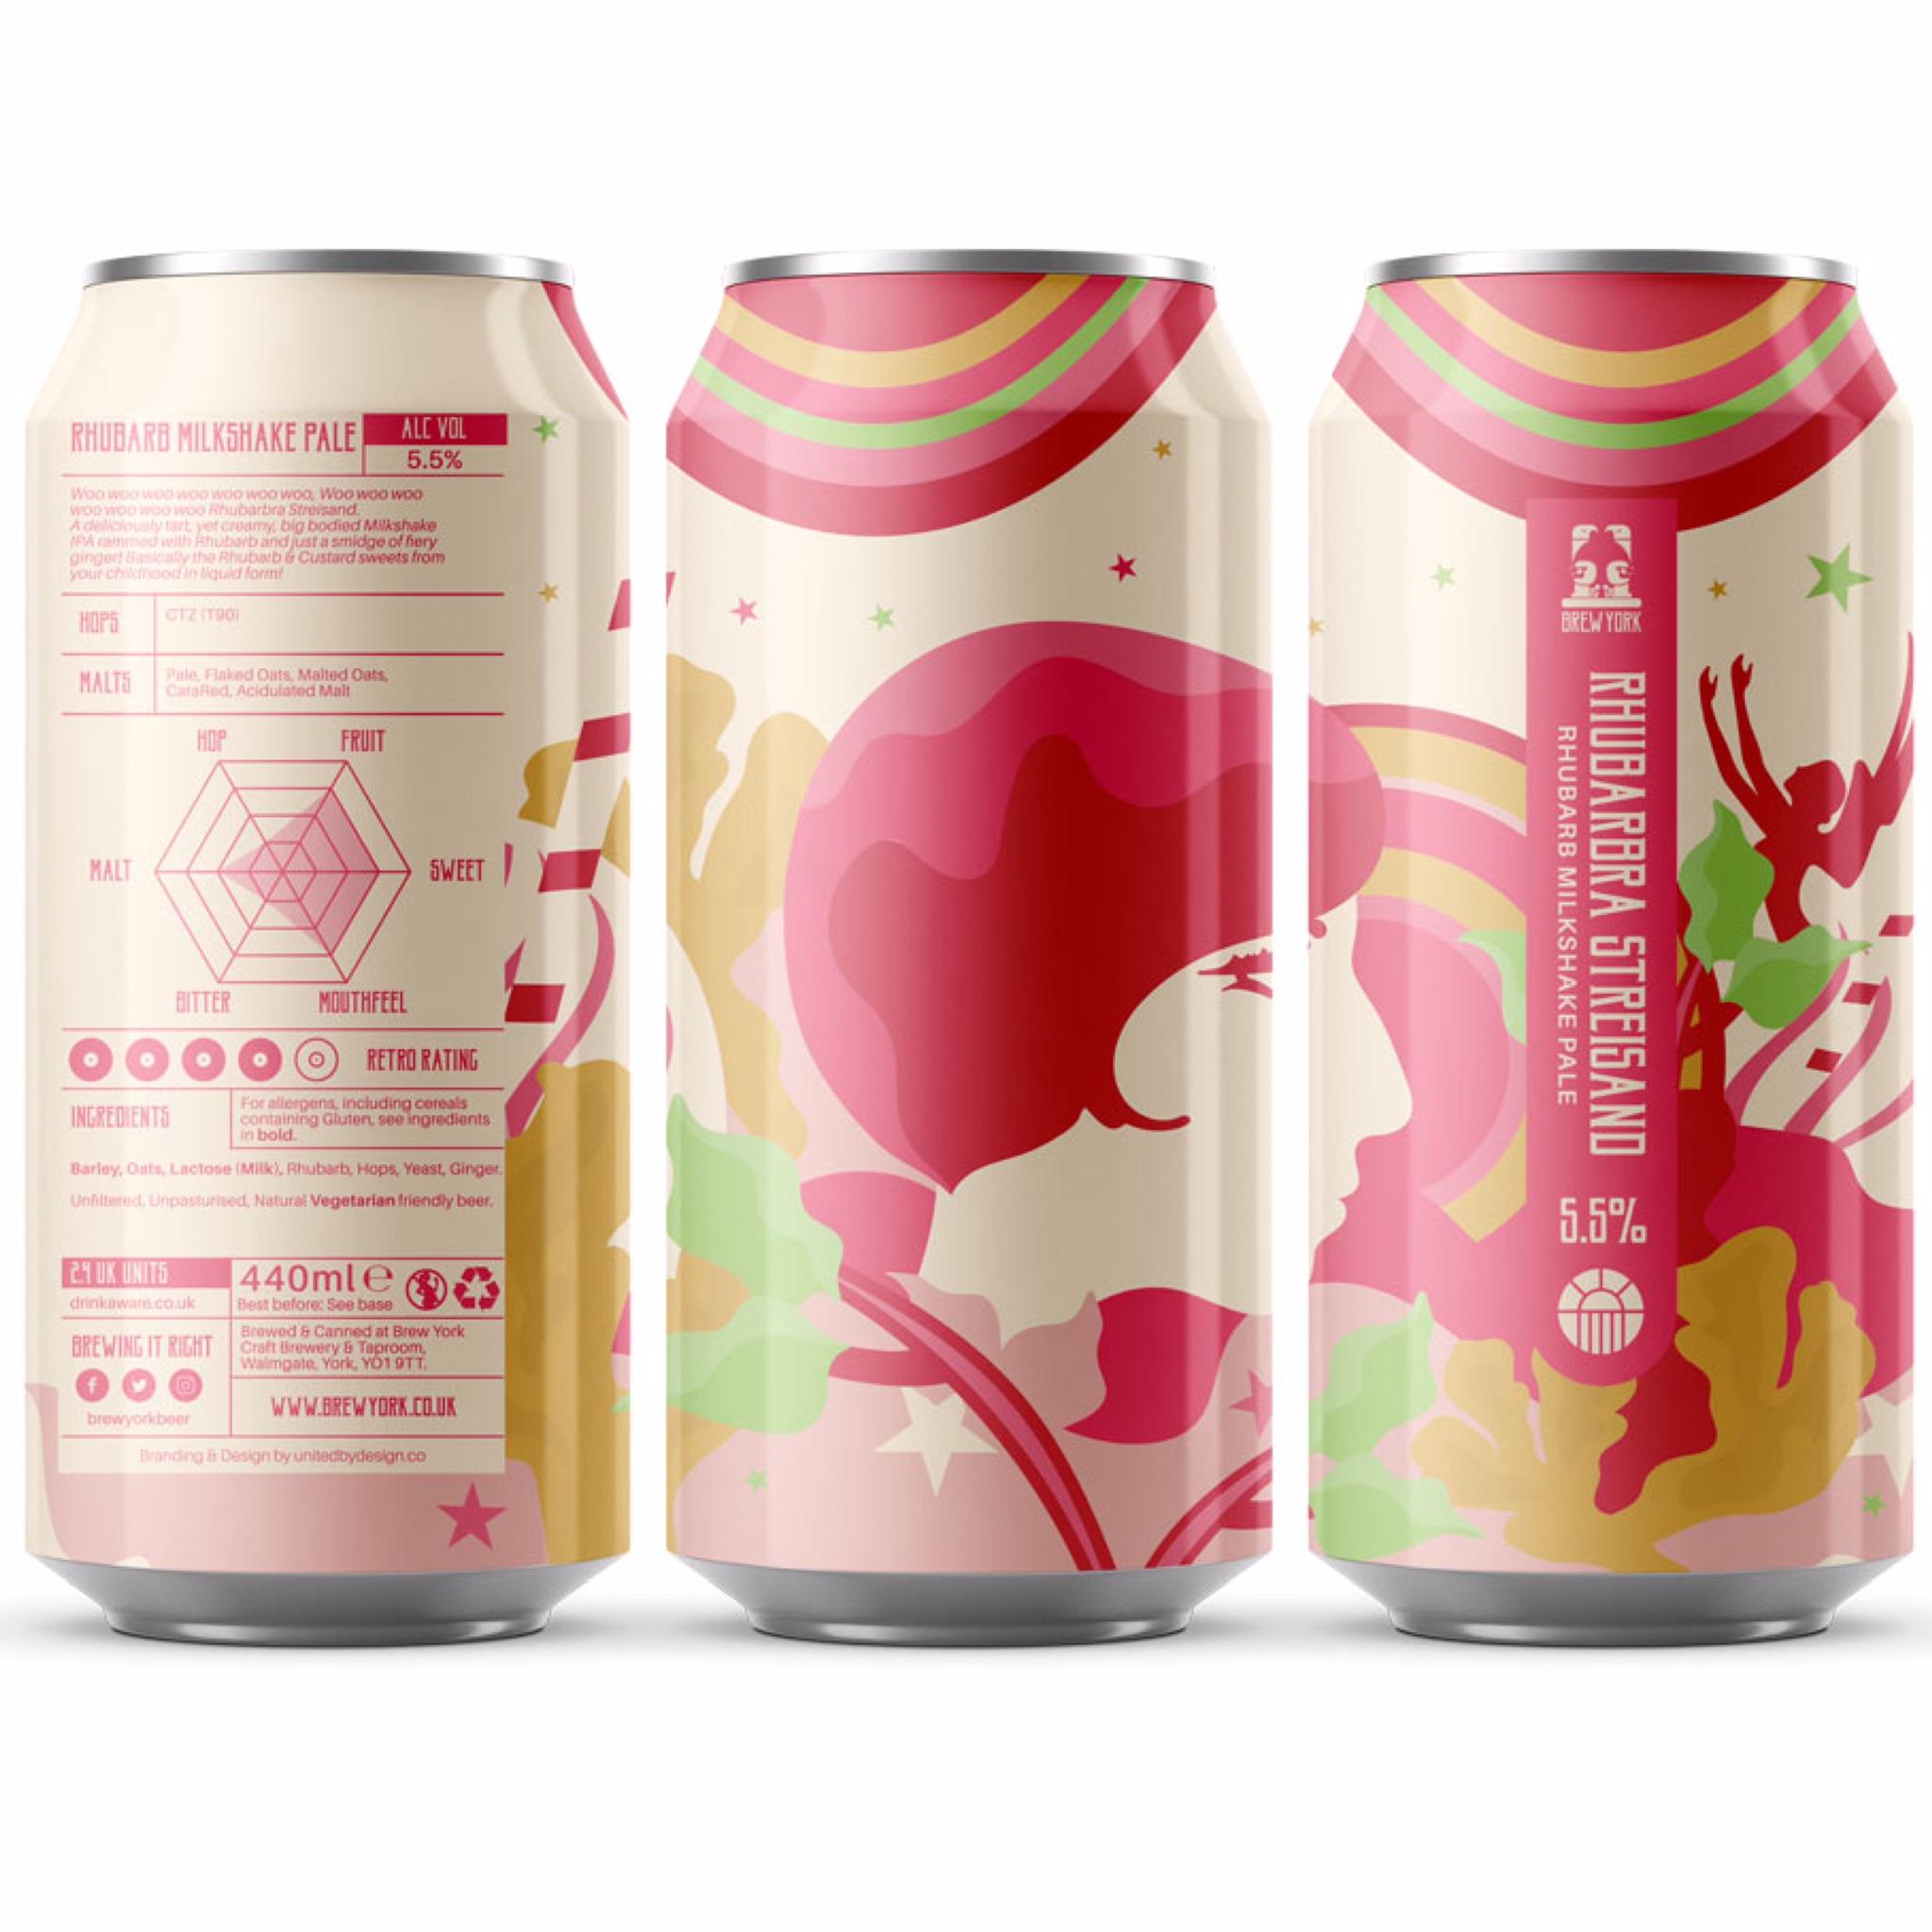 Rhubarbra Streisand Milkshake Pale 5.5% 440ml Brew York